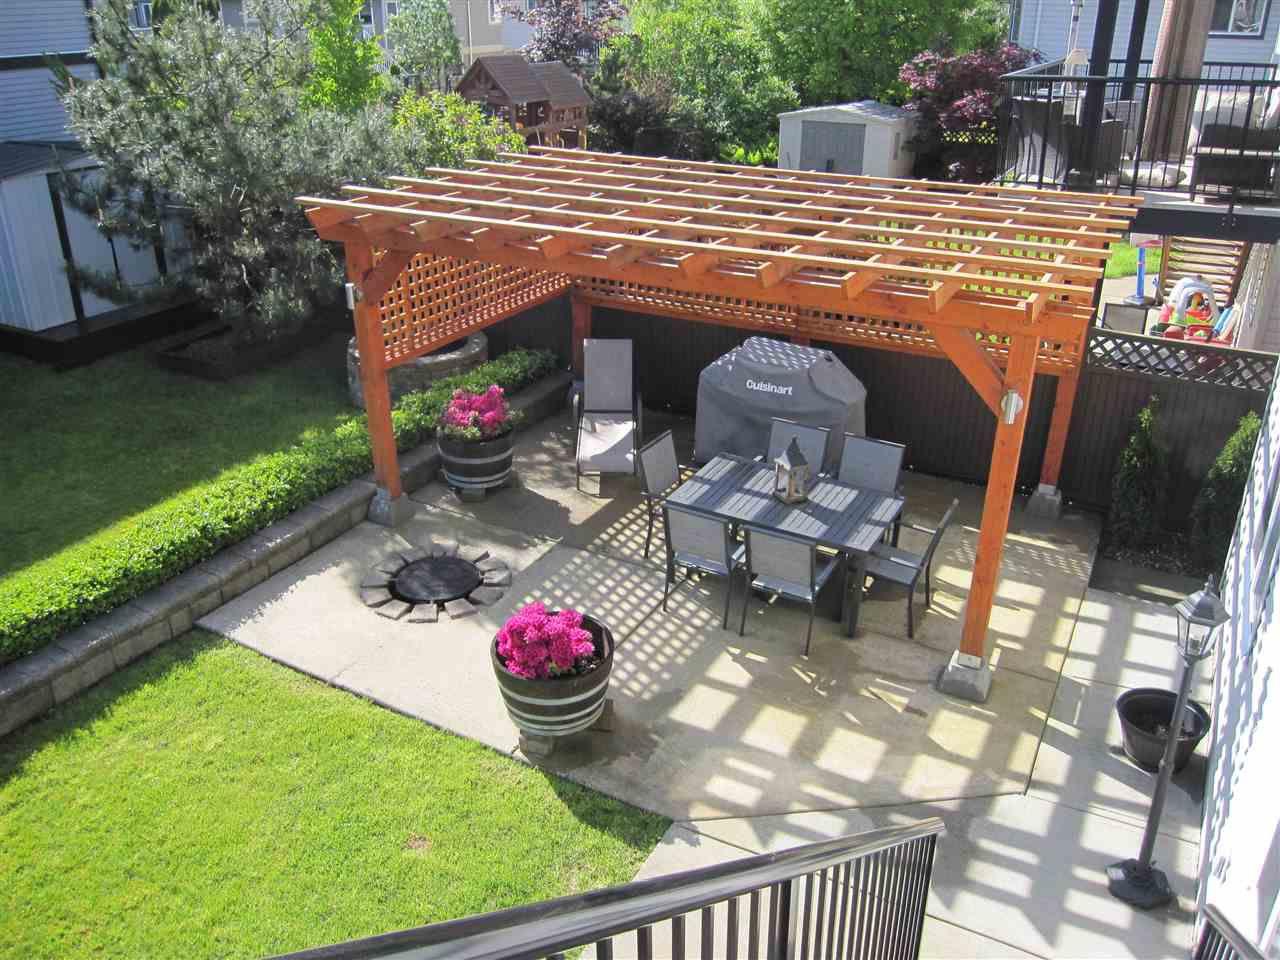 Photo 13: Photos: 11316 236 Street in Maple Ridge: Cottonwood MR House for sale : MLS®# R2062616